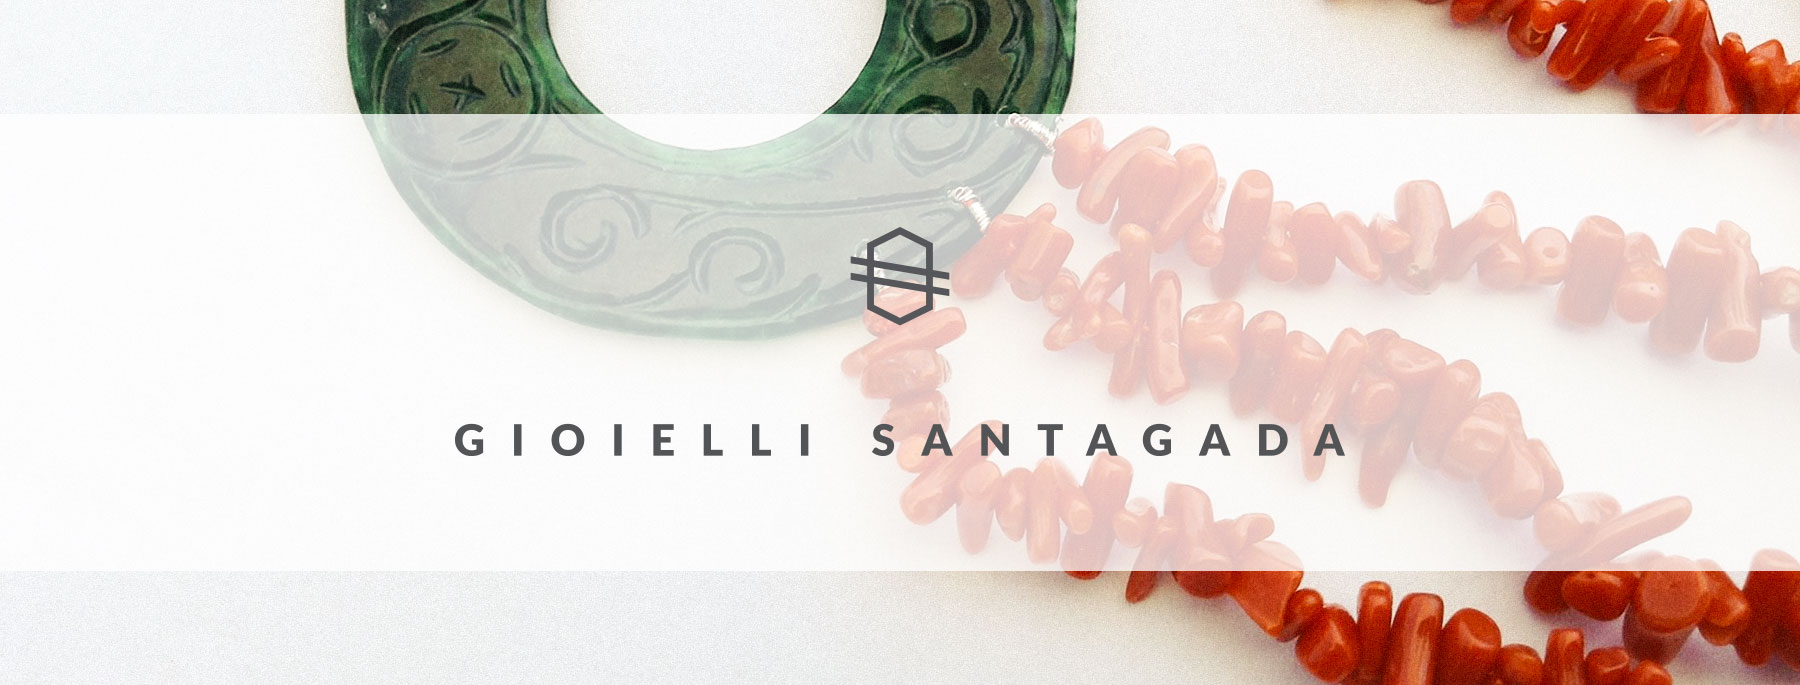 gioielli-santagada-about